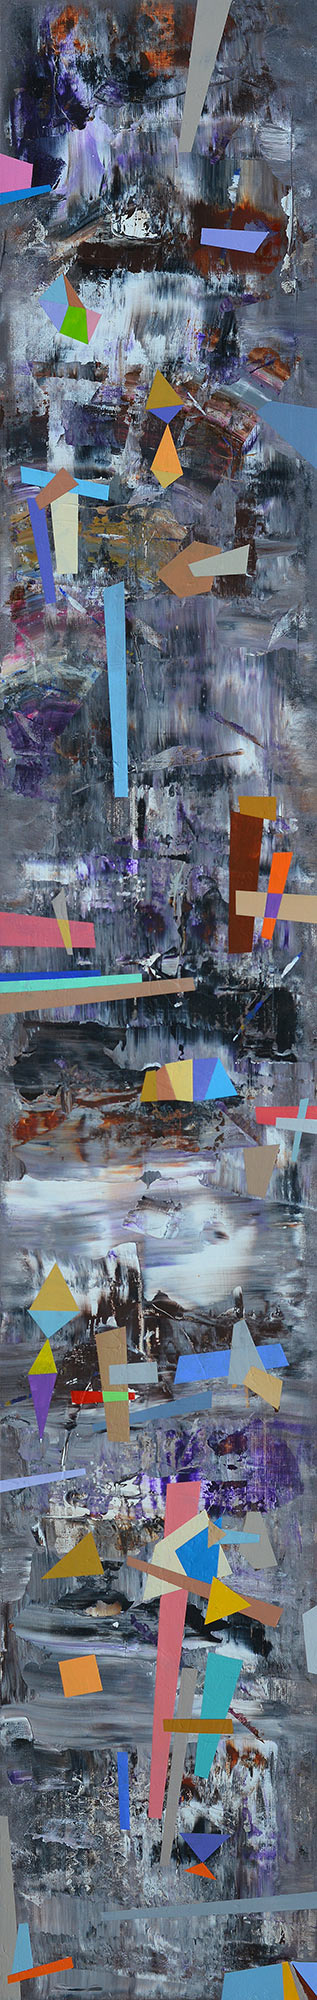 AMBITION, 2017 acrylic on canvas; 145 х 25 cm